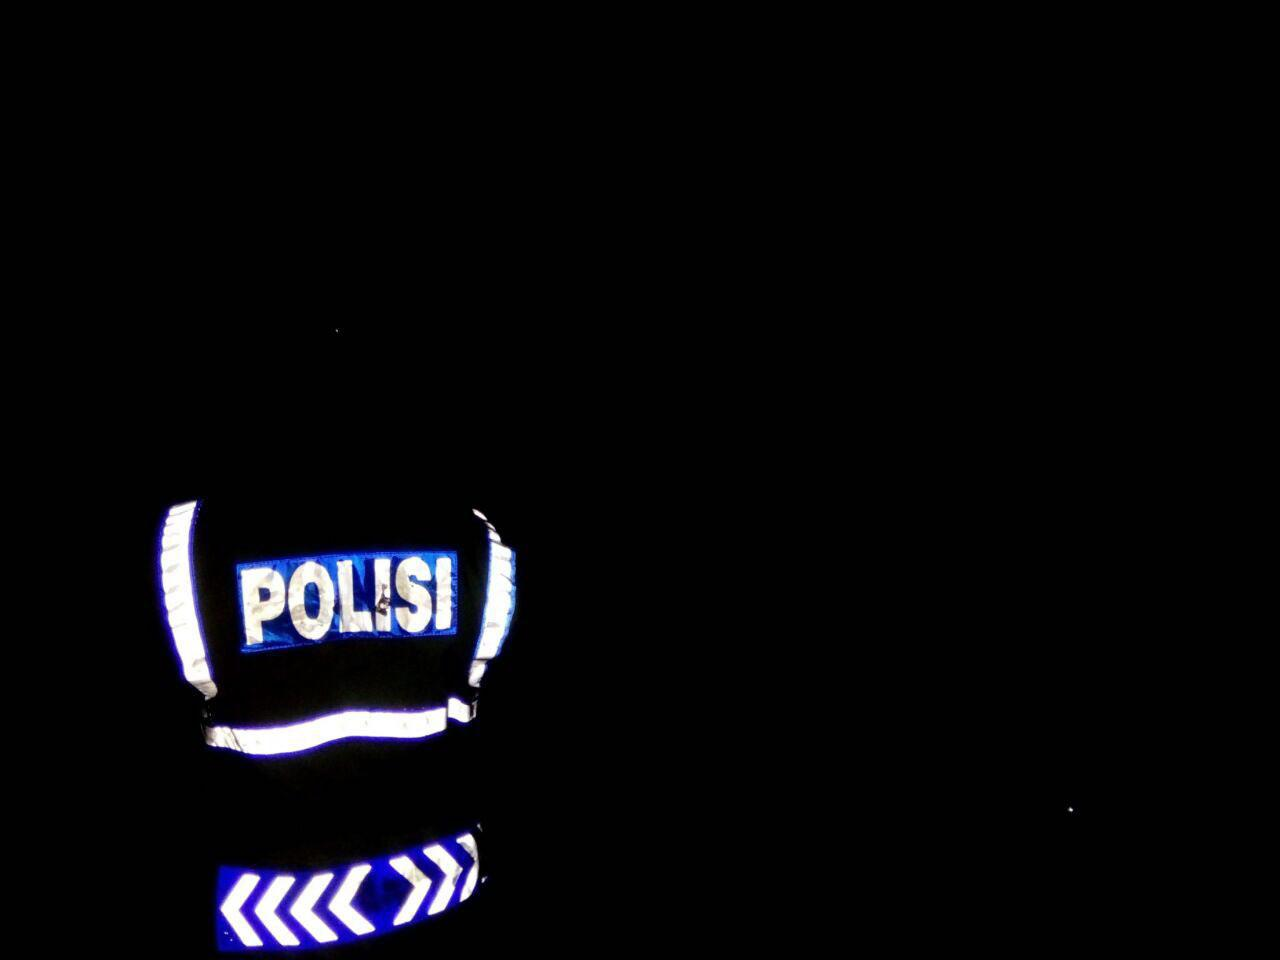 Polsek Mamboro dan Patroli Malamnya Telah Berhasil Gagalkan Pencurian Kerbau